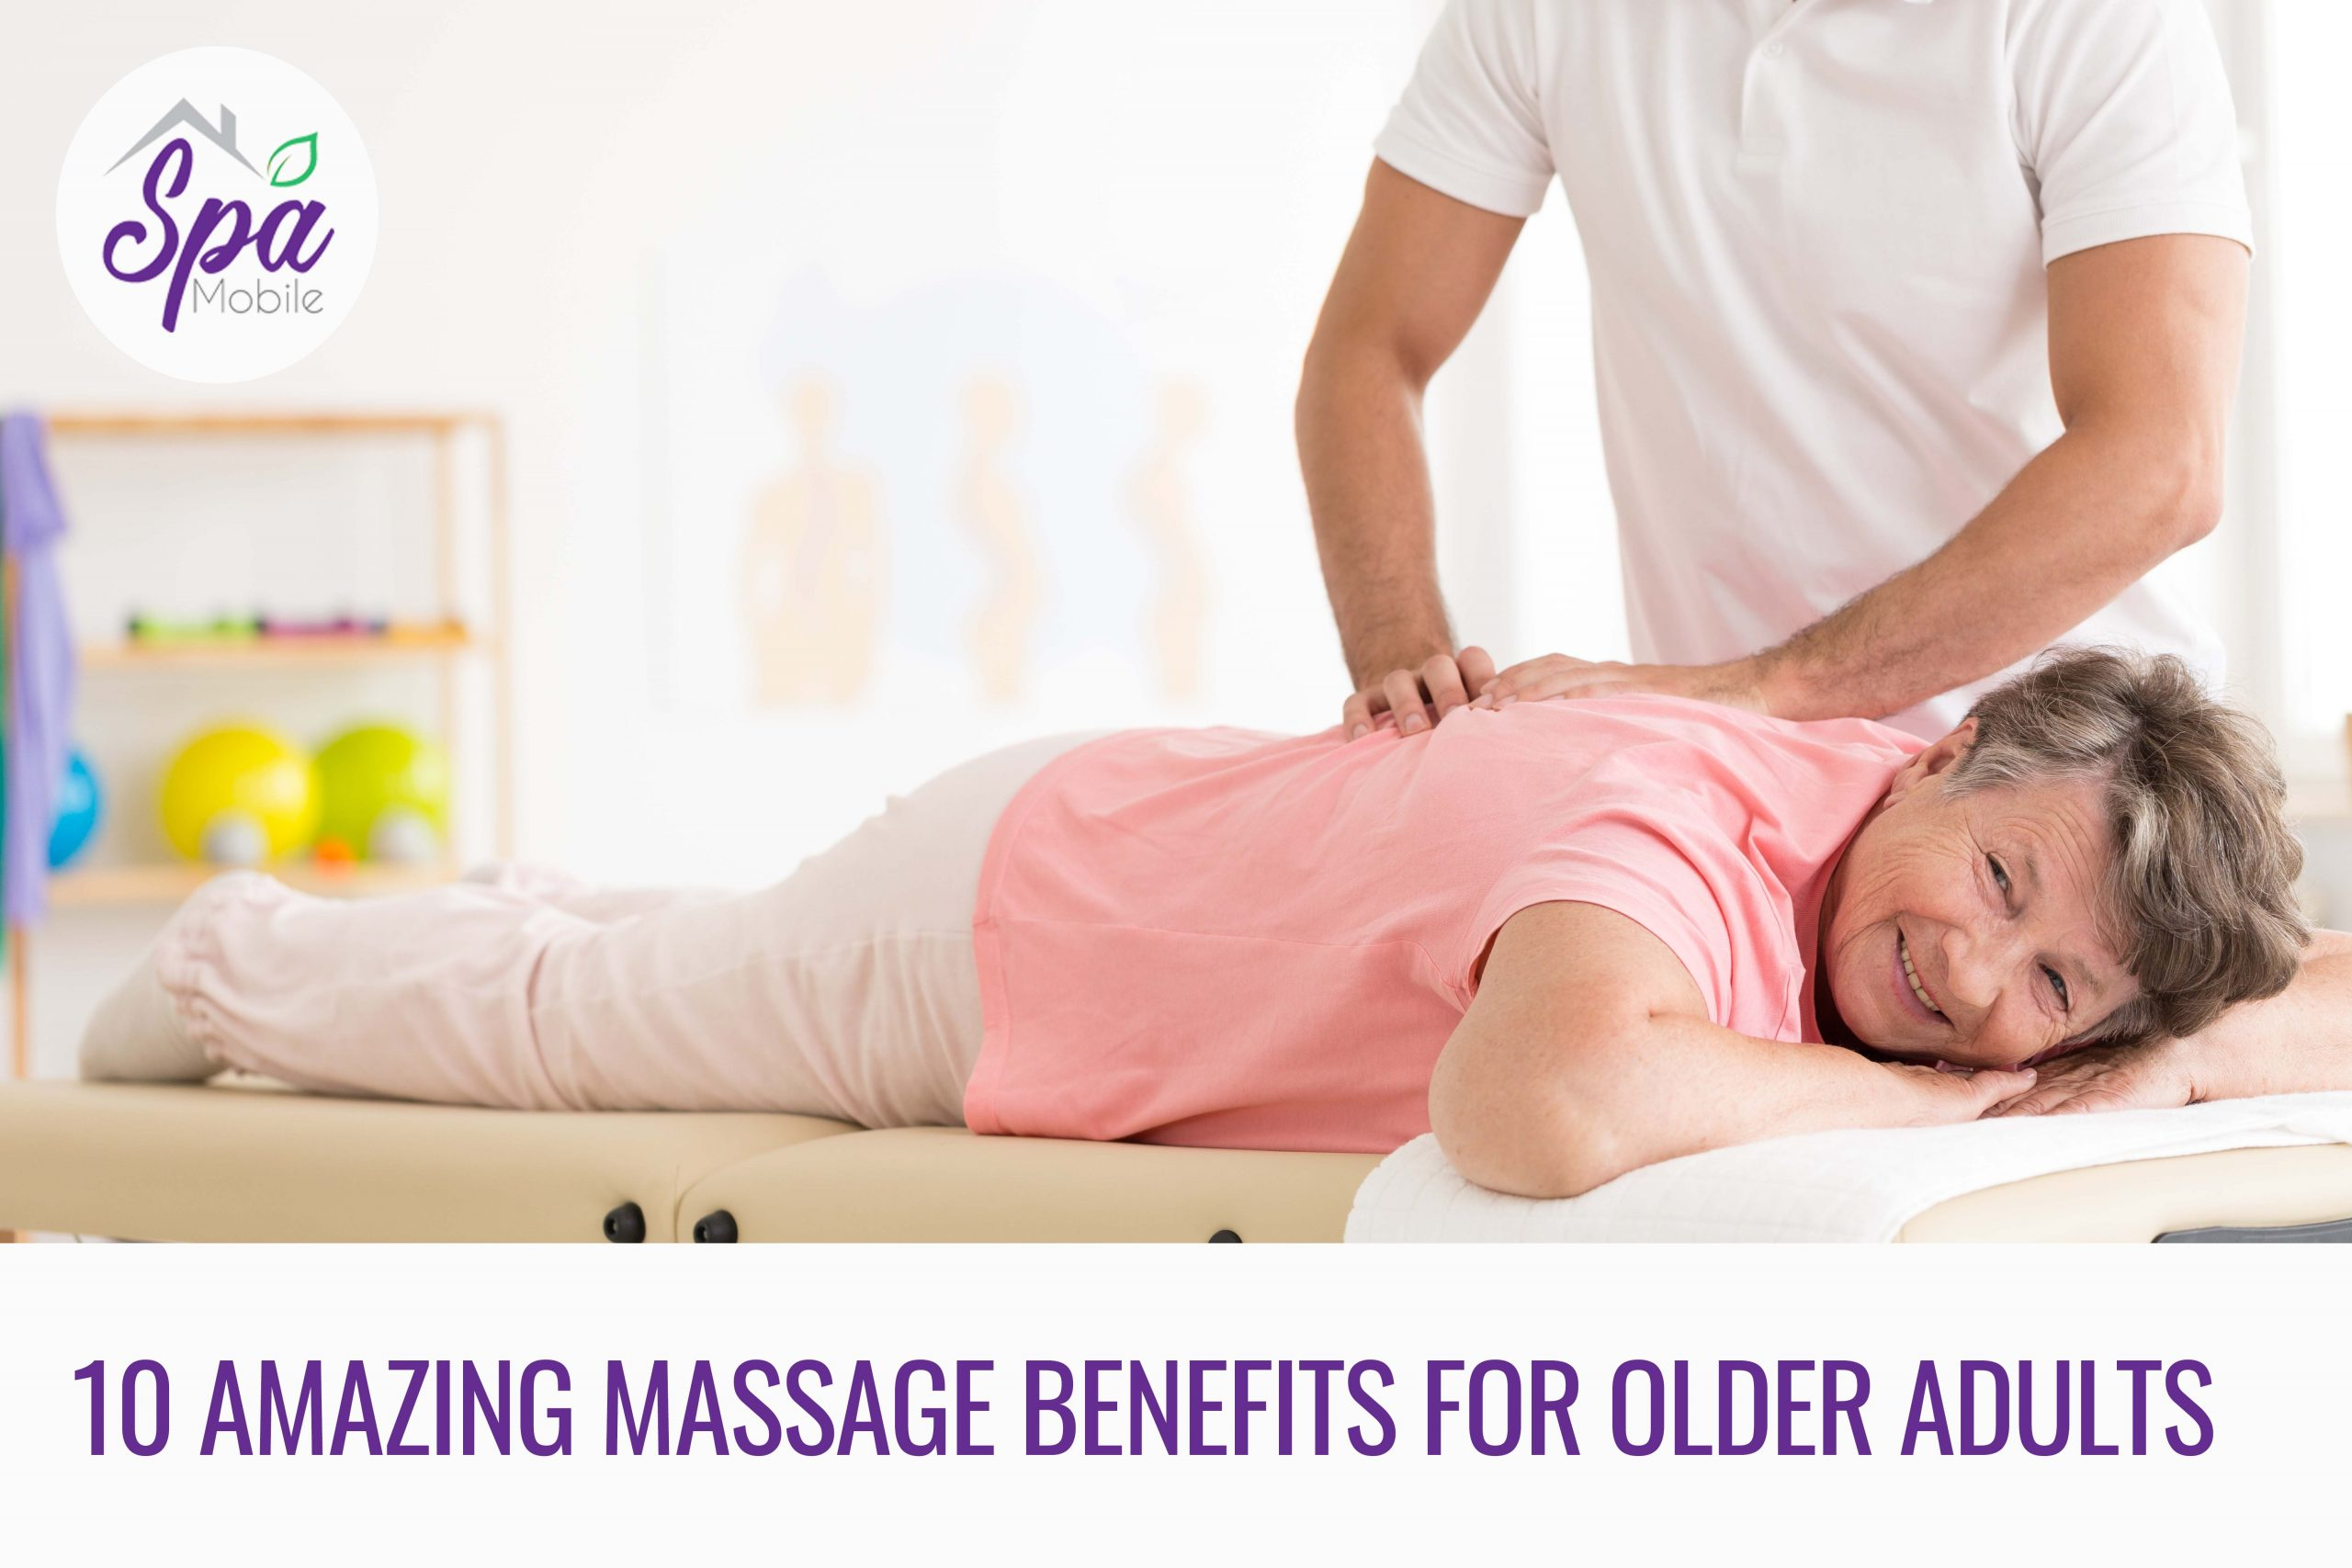 10 Amazing Massage Benefits For Older Adults 2